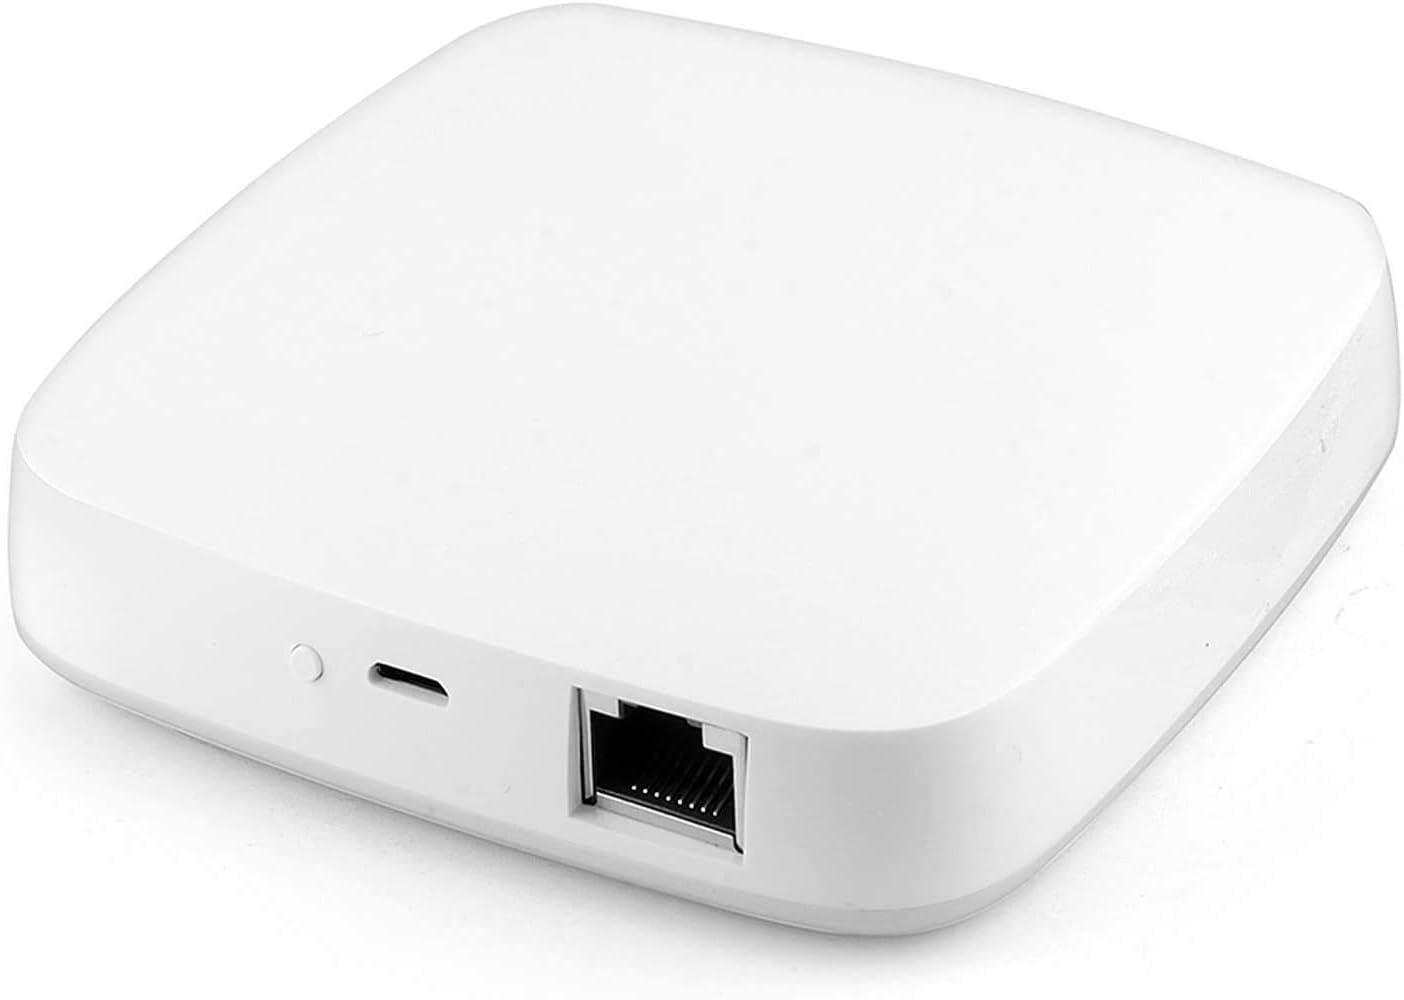 Yueyang ZigBee Gateway tuya Hub Smart, cableado Smart Home Bridge Tuya/Smart Life inteligentes APP Control remoto con alexa RJ45 interfaz ZigBee 3.0